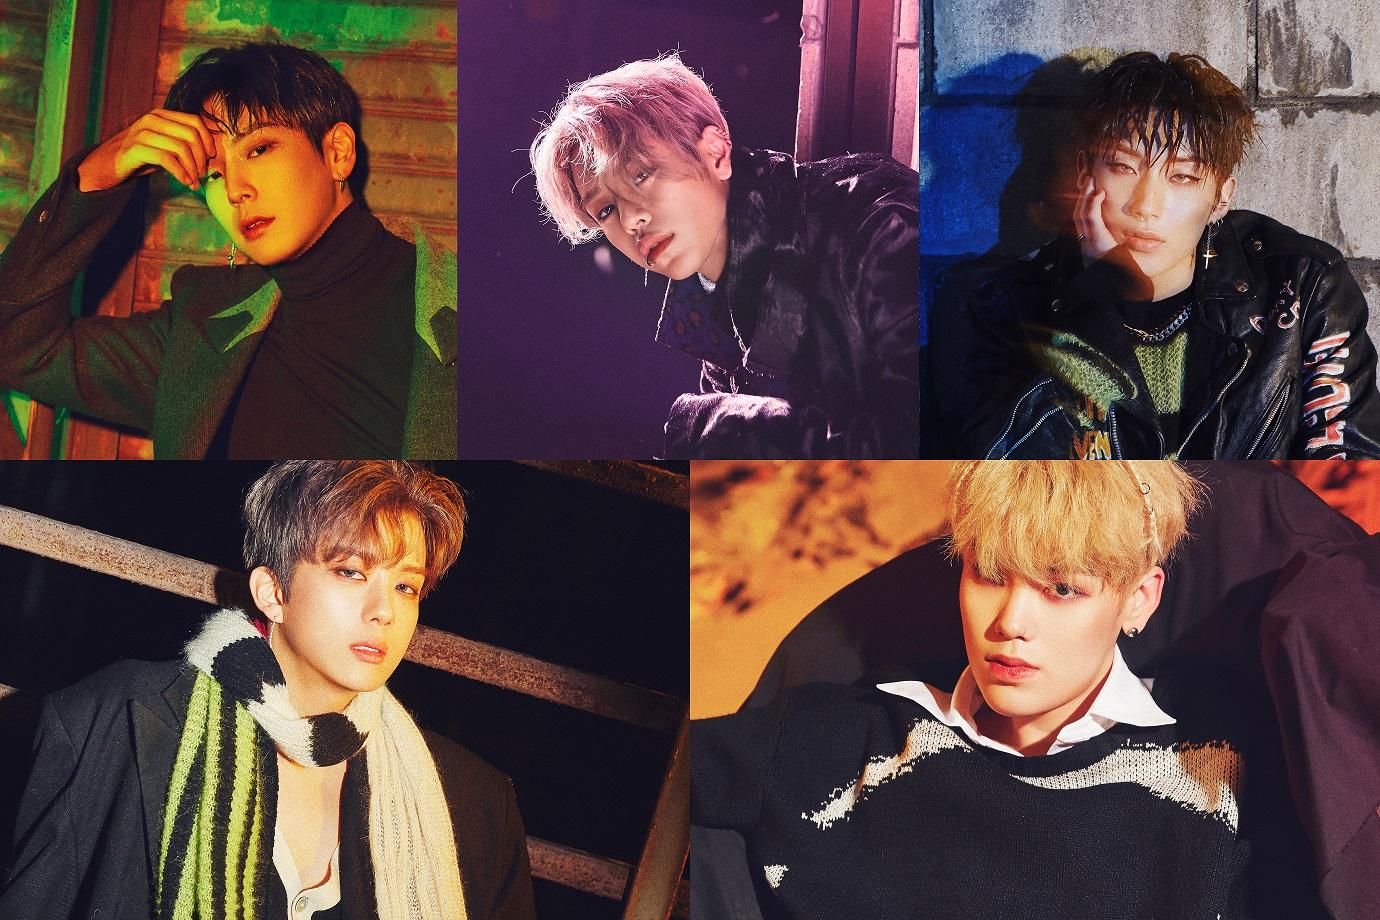 bap, bap profile, bap facts, bap members, bap weight, bap height, bap company, bap songs, bap comeback, bap debut, bap leader, bap vocal,